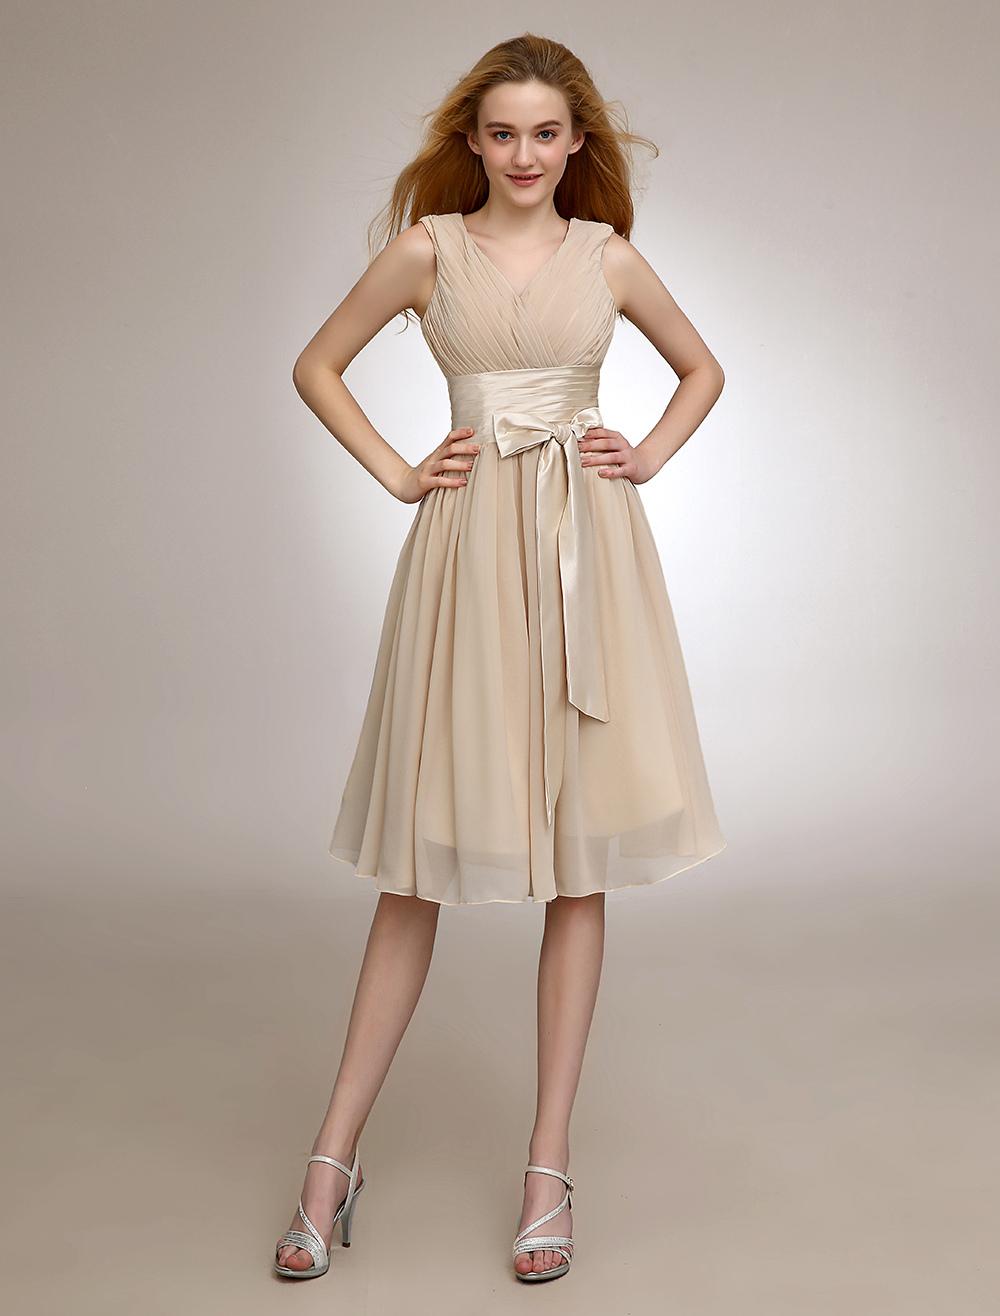 Gold Champagne V-Neck Chiffon Bridesmaid Dress With Sash